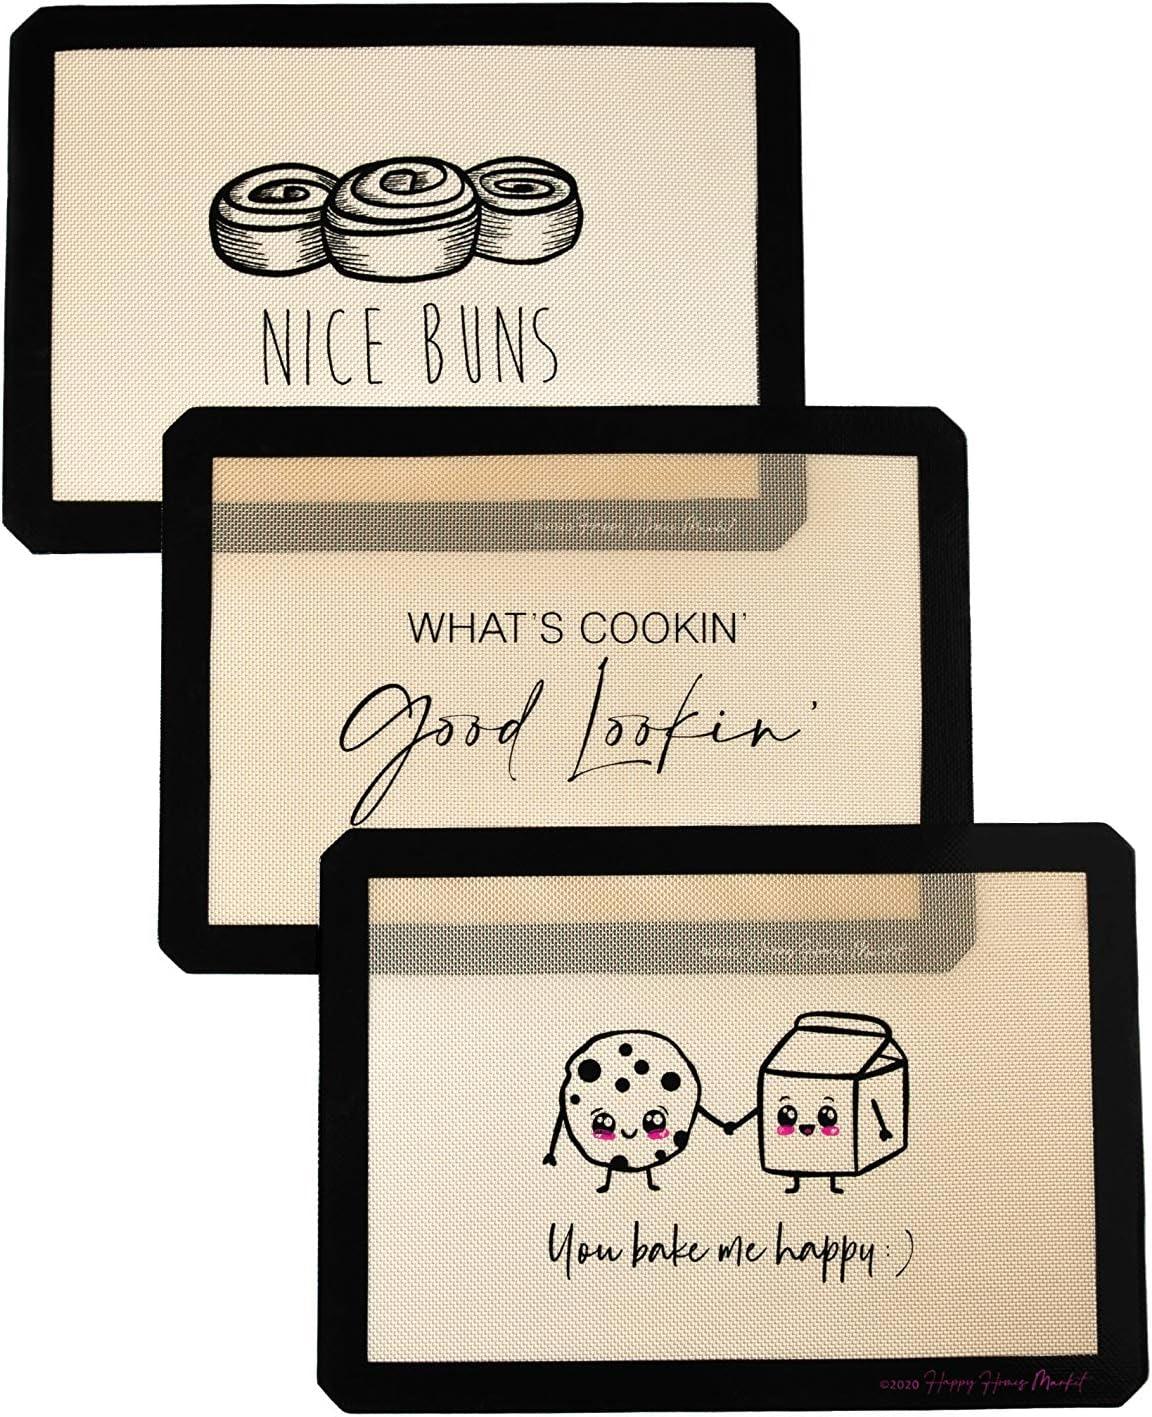 Happy Homes Market, Silicone Baking Mat, Non-Stick, Professional Grade Quality Baking Mat, Food Safe, BPA Free, Reusable, Eco-Friendly, Luxury Baking Sheet Liner- Set of 3 Standard Half Sheet Sizes